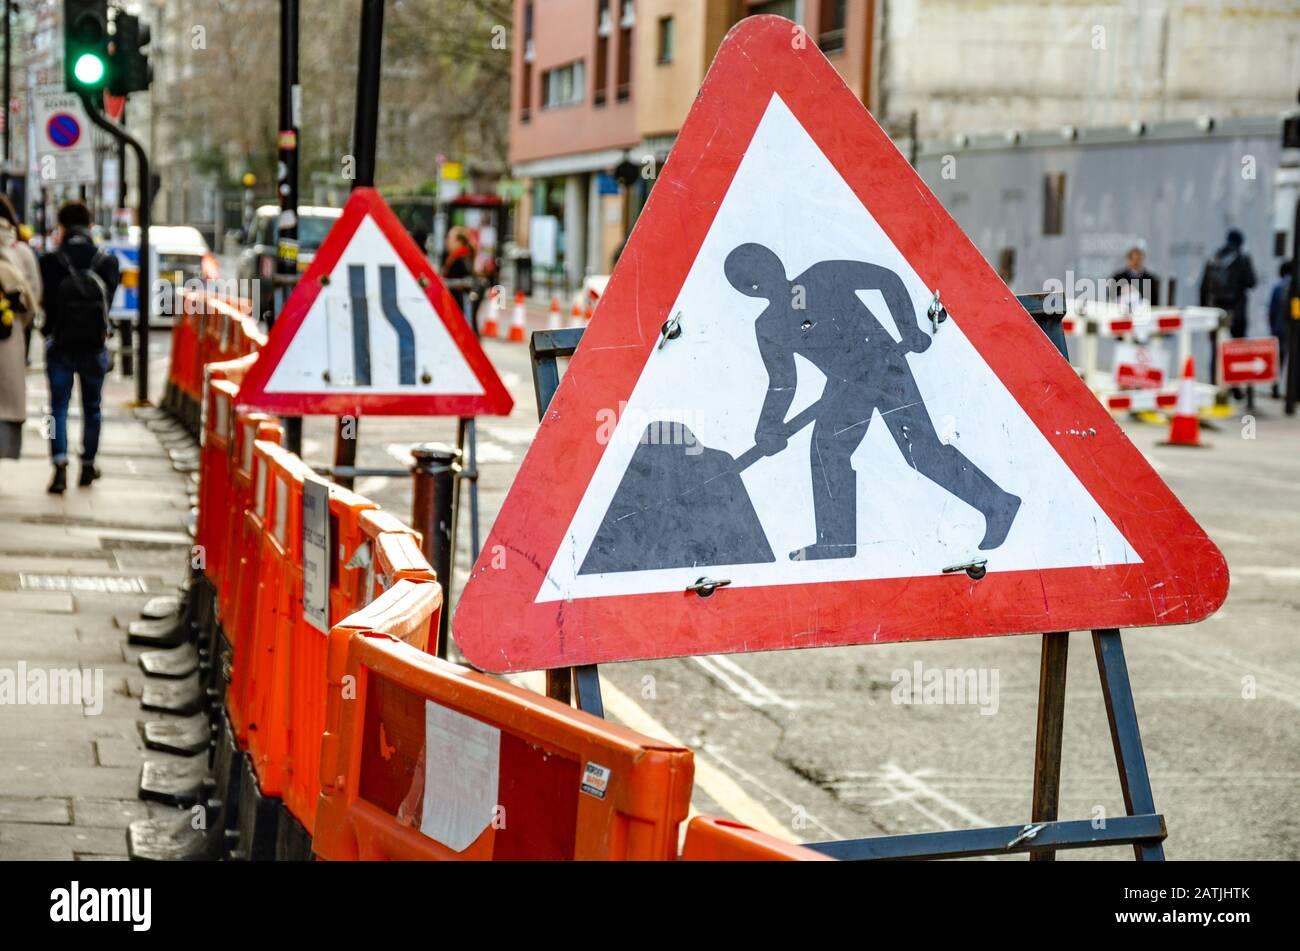 red-triangular-road-signs-warn-of-roadworks-and-narrow-lanes-2ATJHTK.jpg